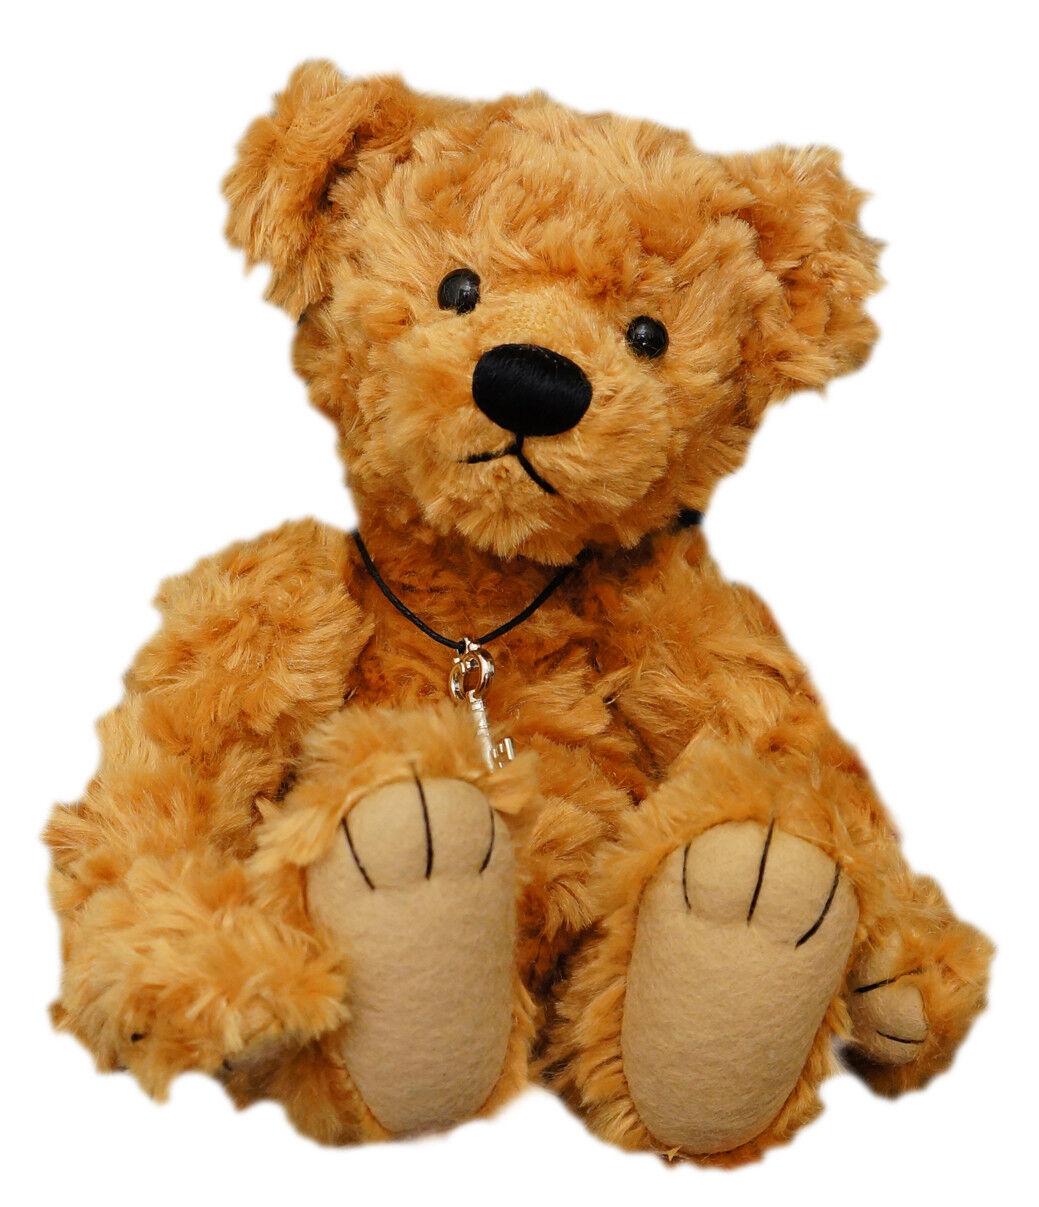 CLEMENS Simon Teddy Bear 25cm Dark gold Plush soft toy New